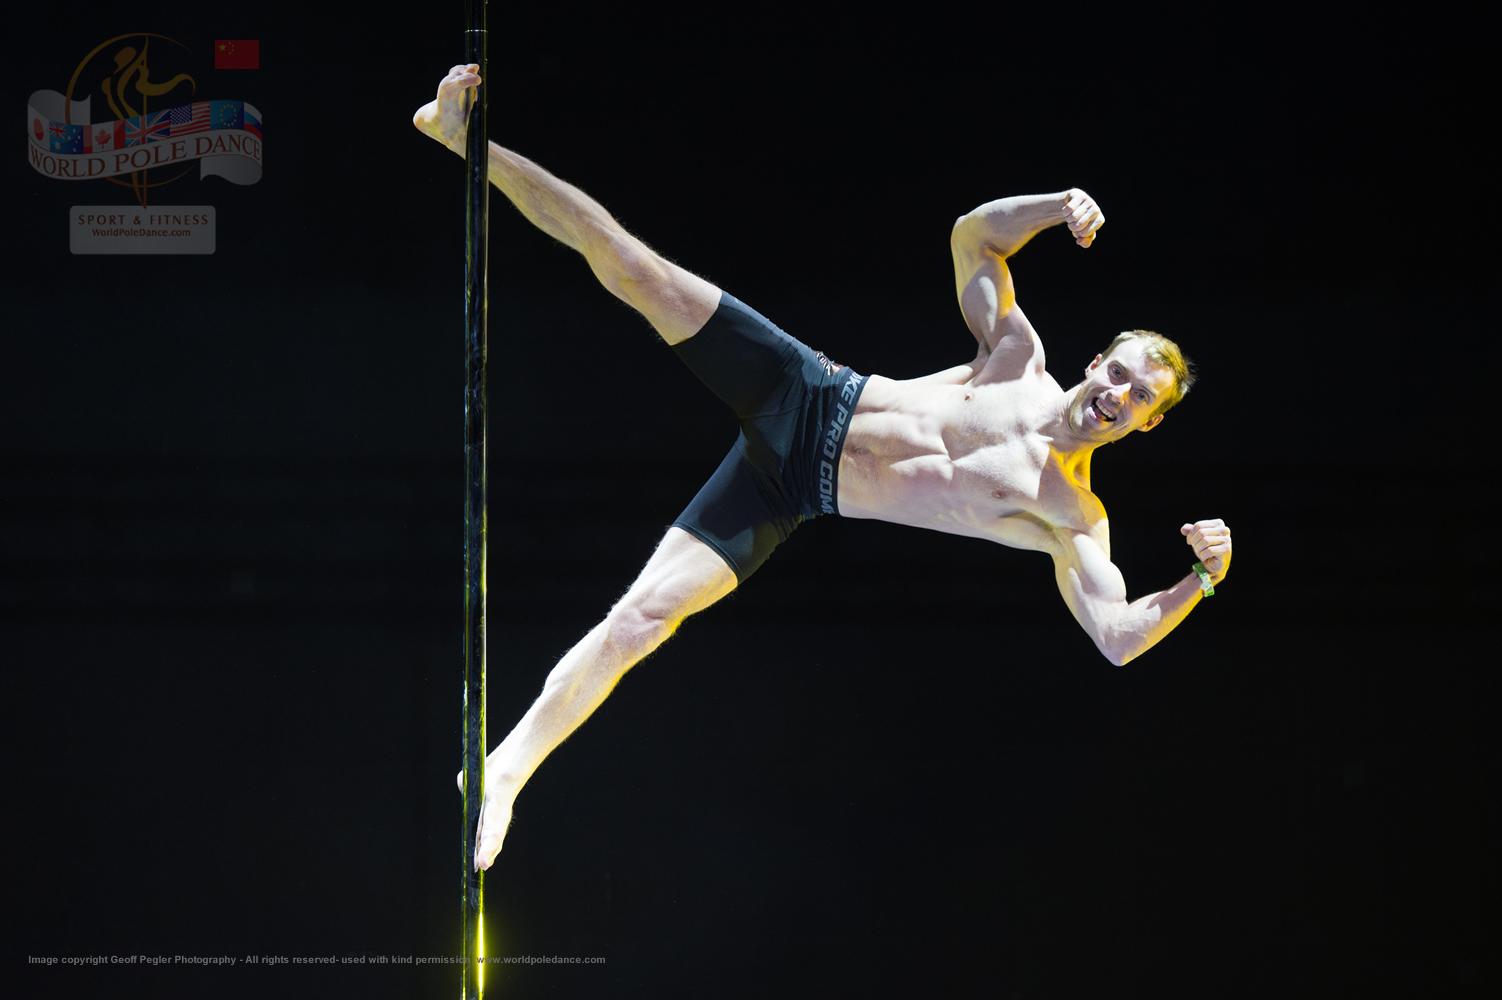 Kristian Lebedev RUSSIA